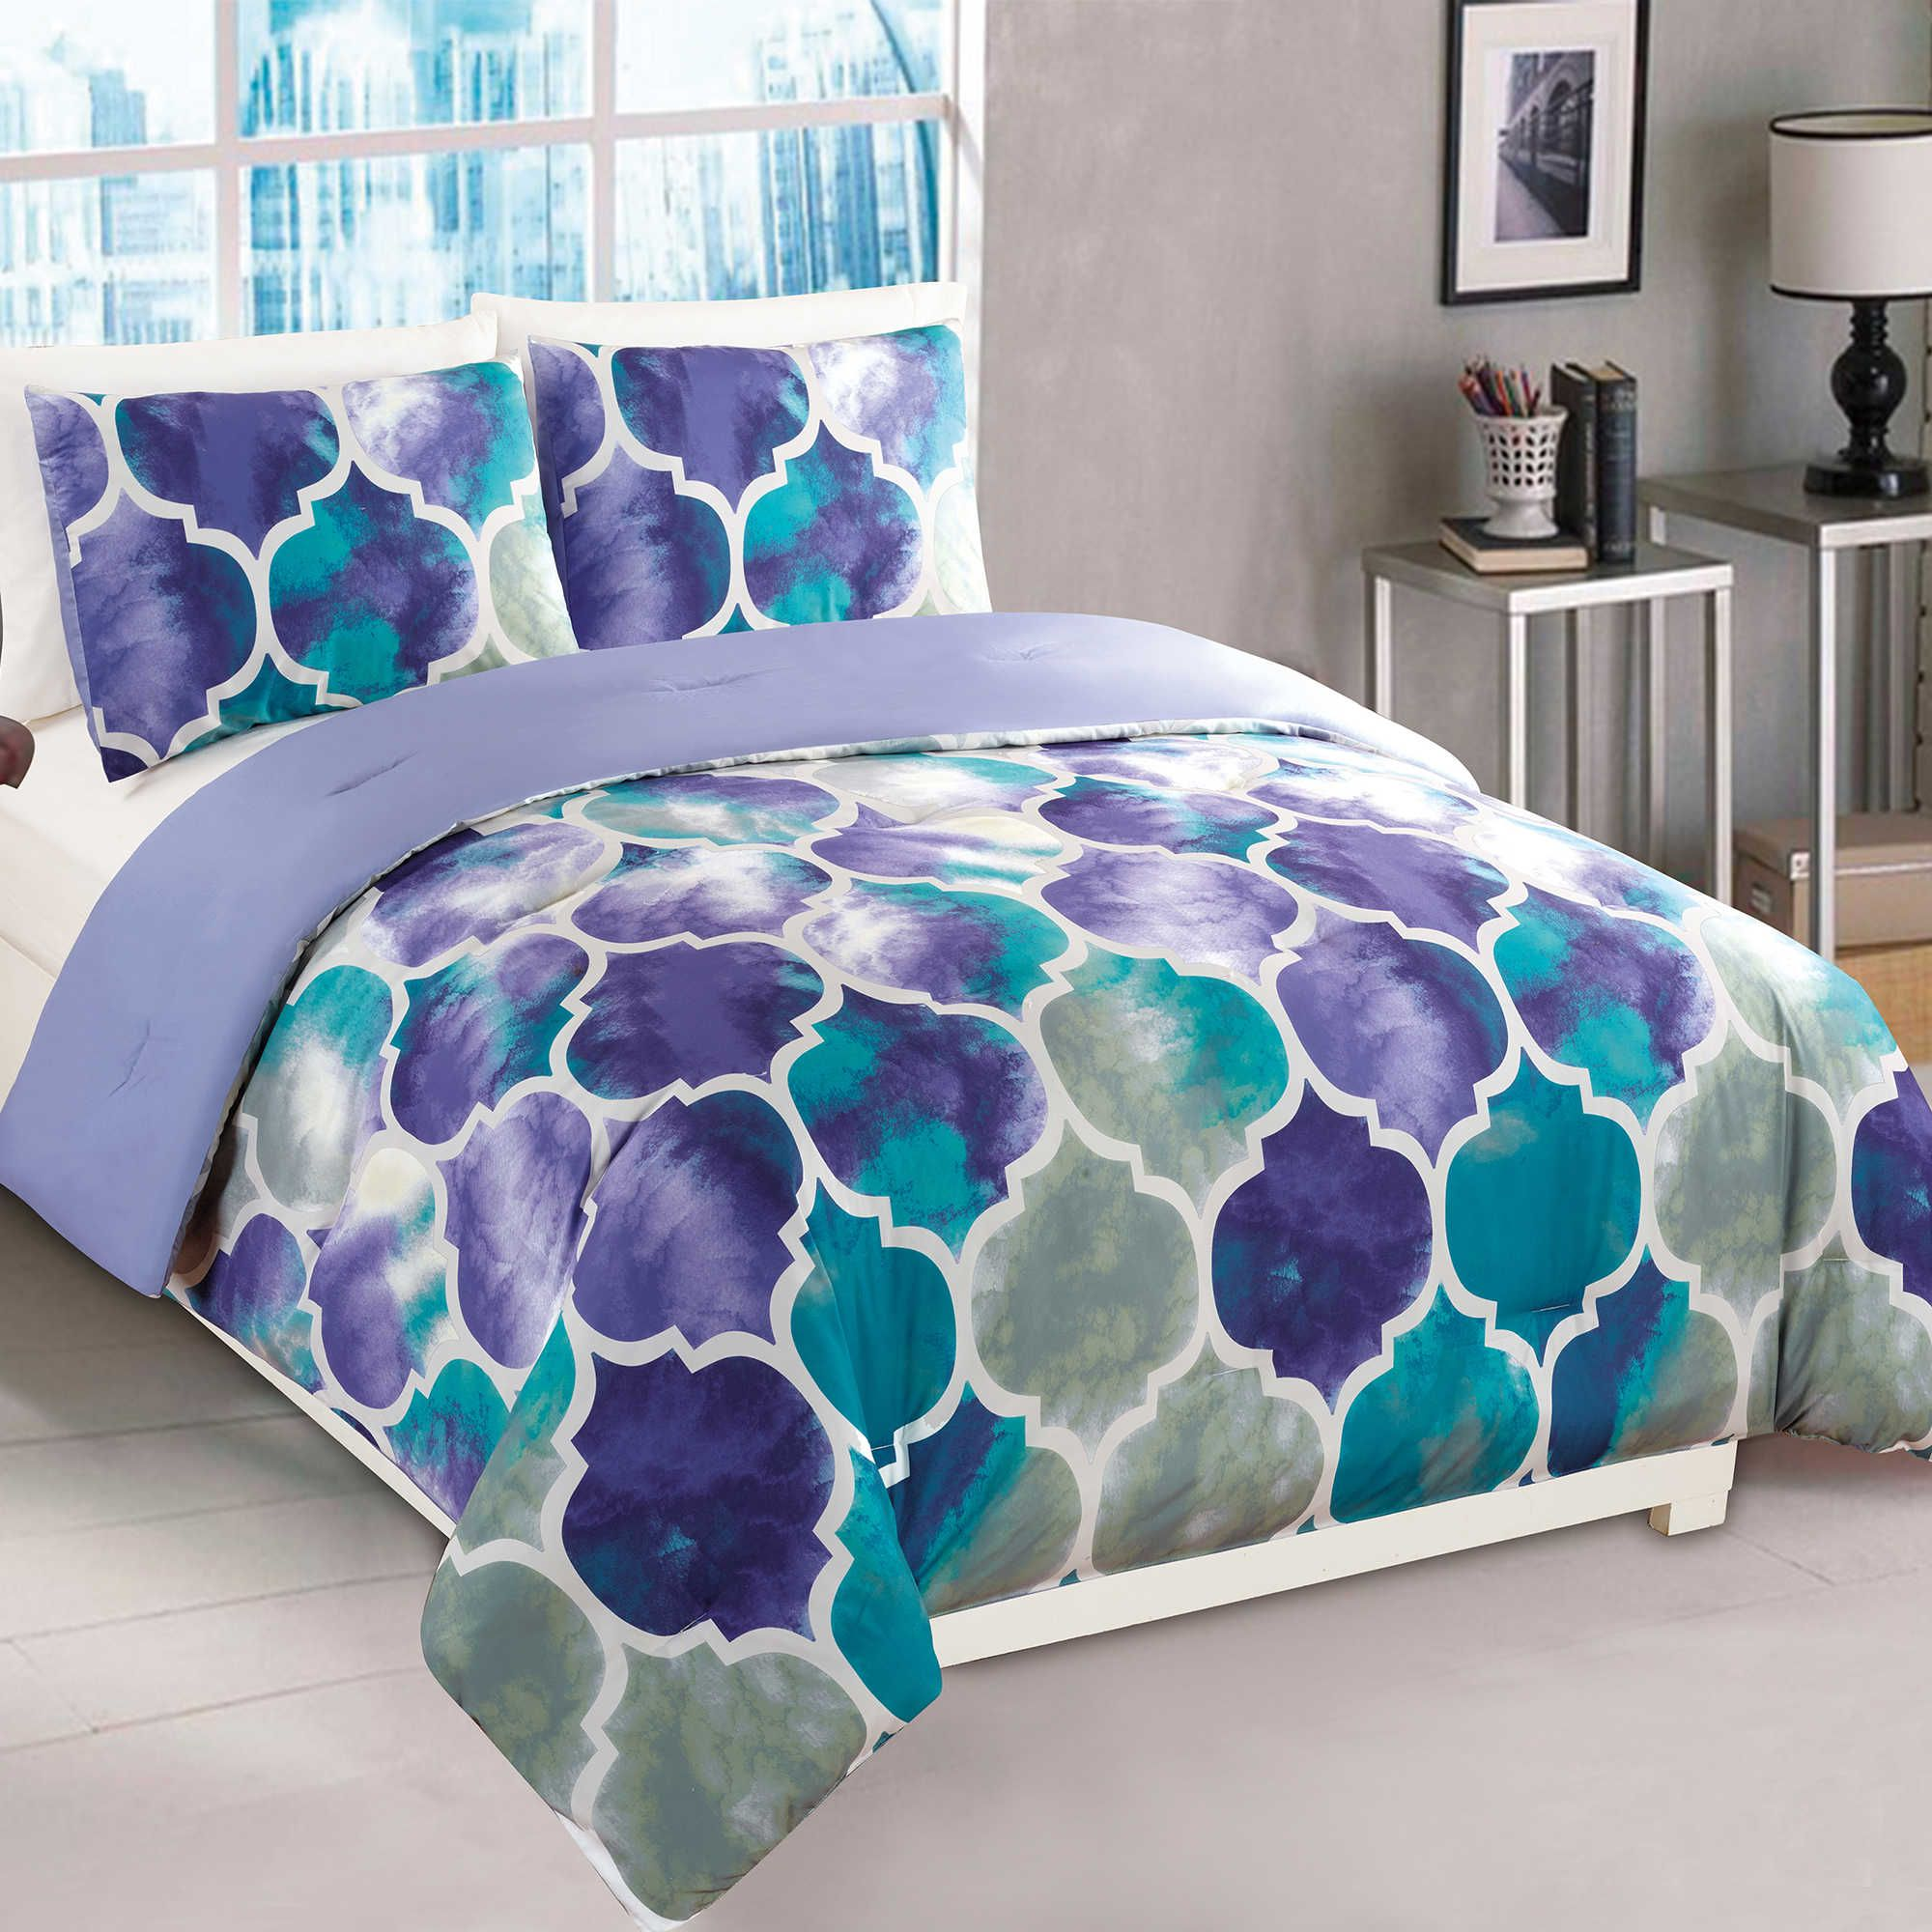 Twin bedding guest room -  79 99 Emmi 2 Piece Twin Comforter Set In Purple Teal